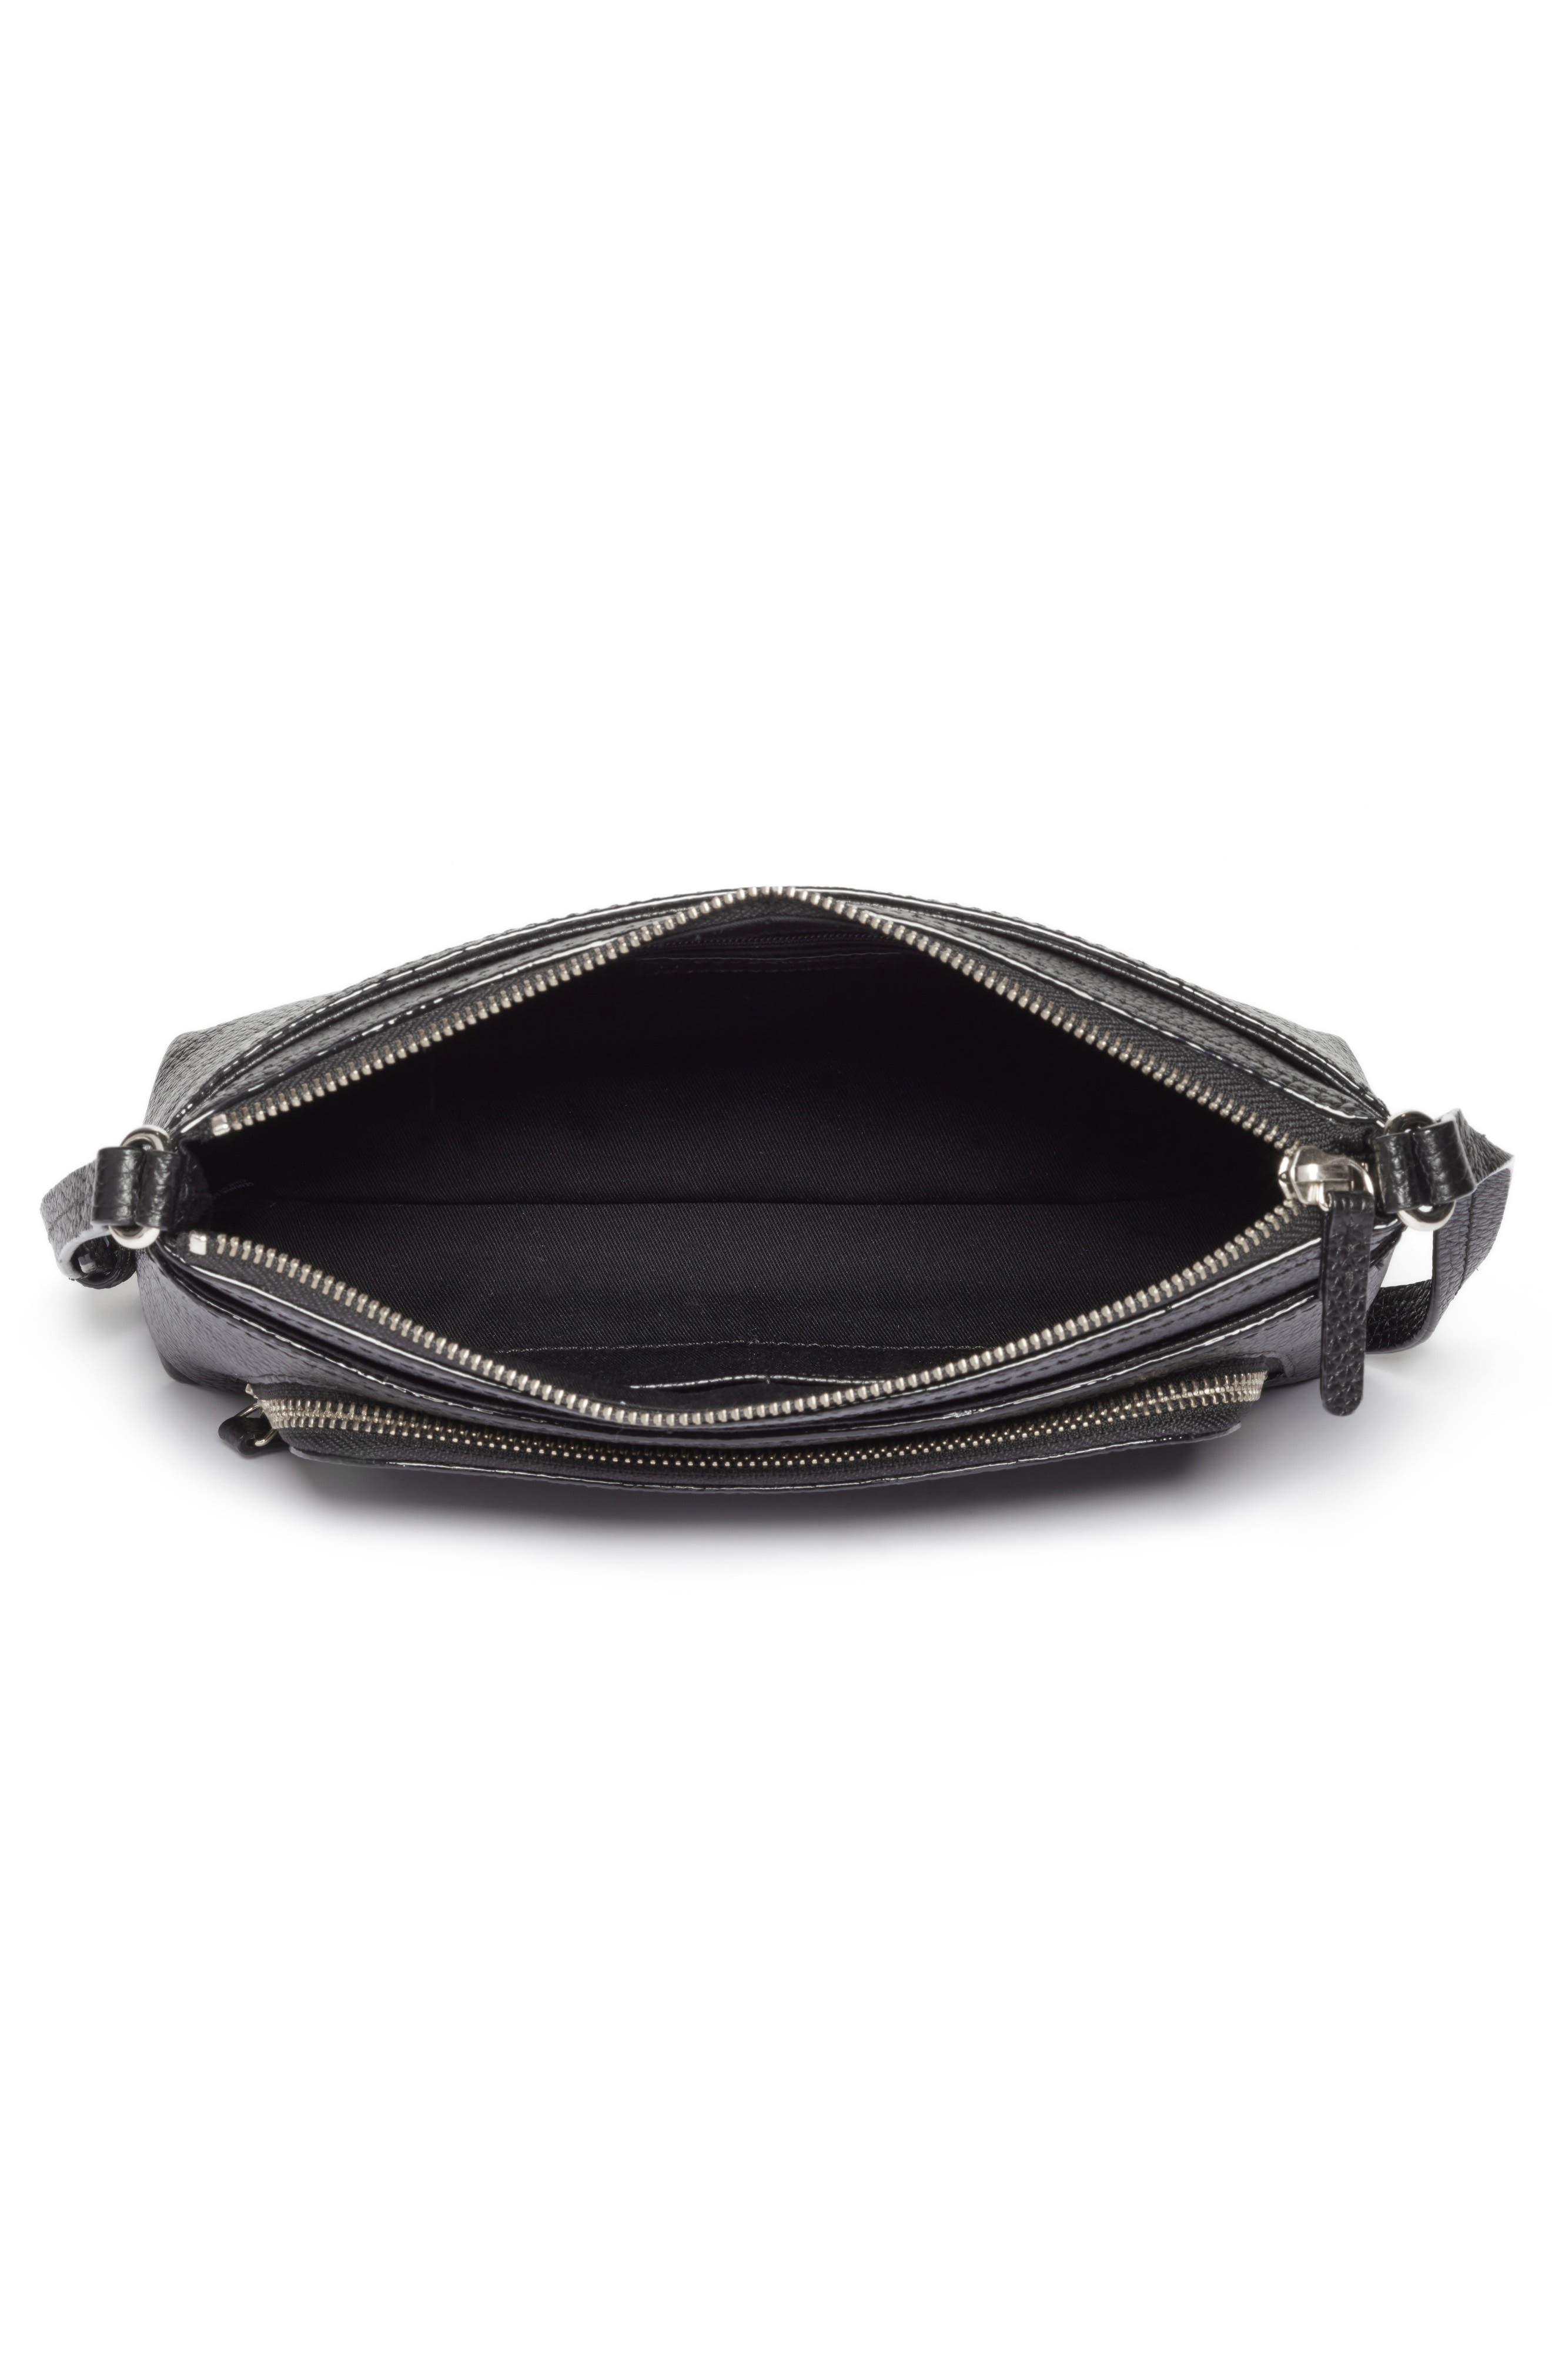 Pebbled Leather Crossbody Bag,                             Alternate thumbnail 4, color,                             Black